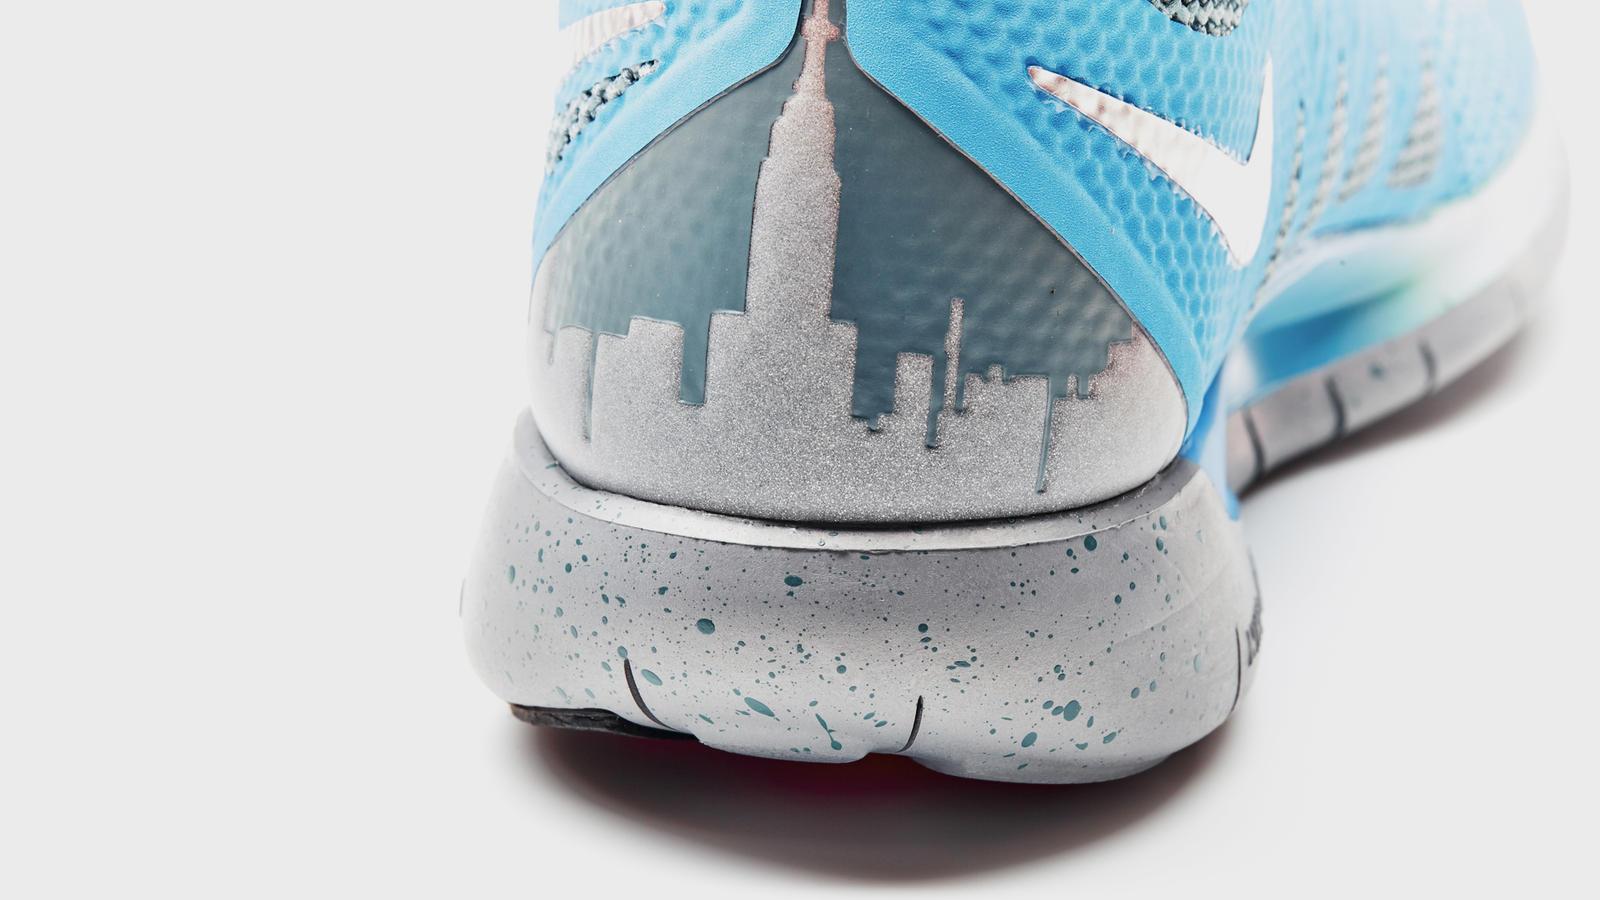 Missy_Footwear_Details_0004